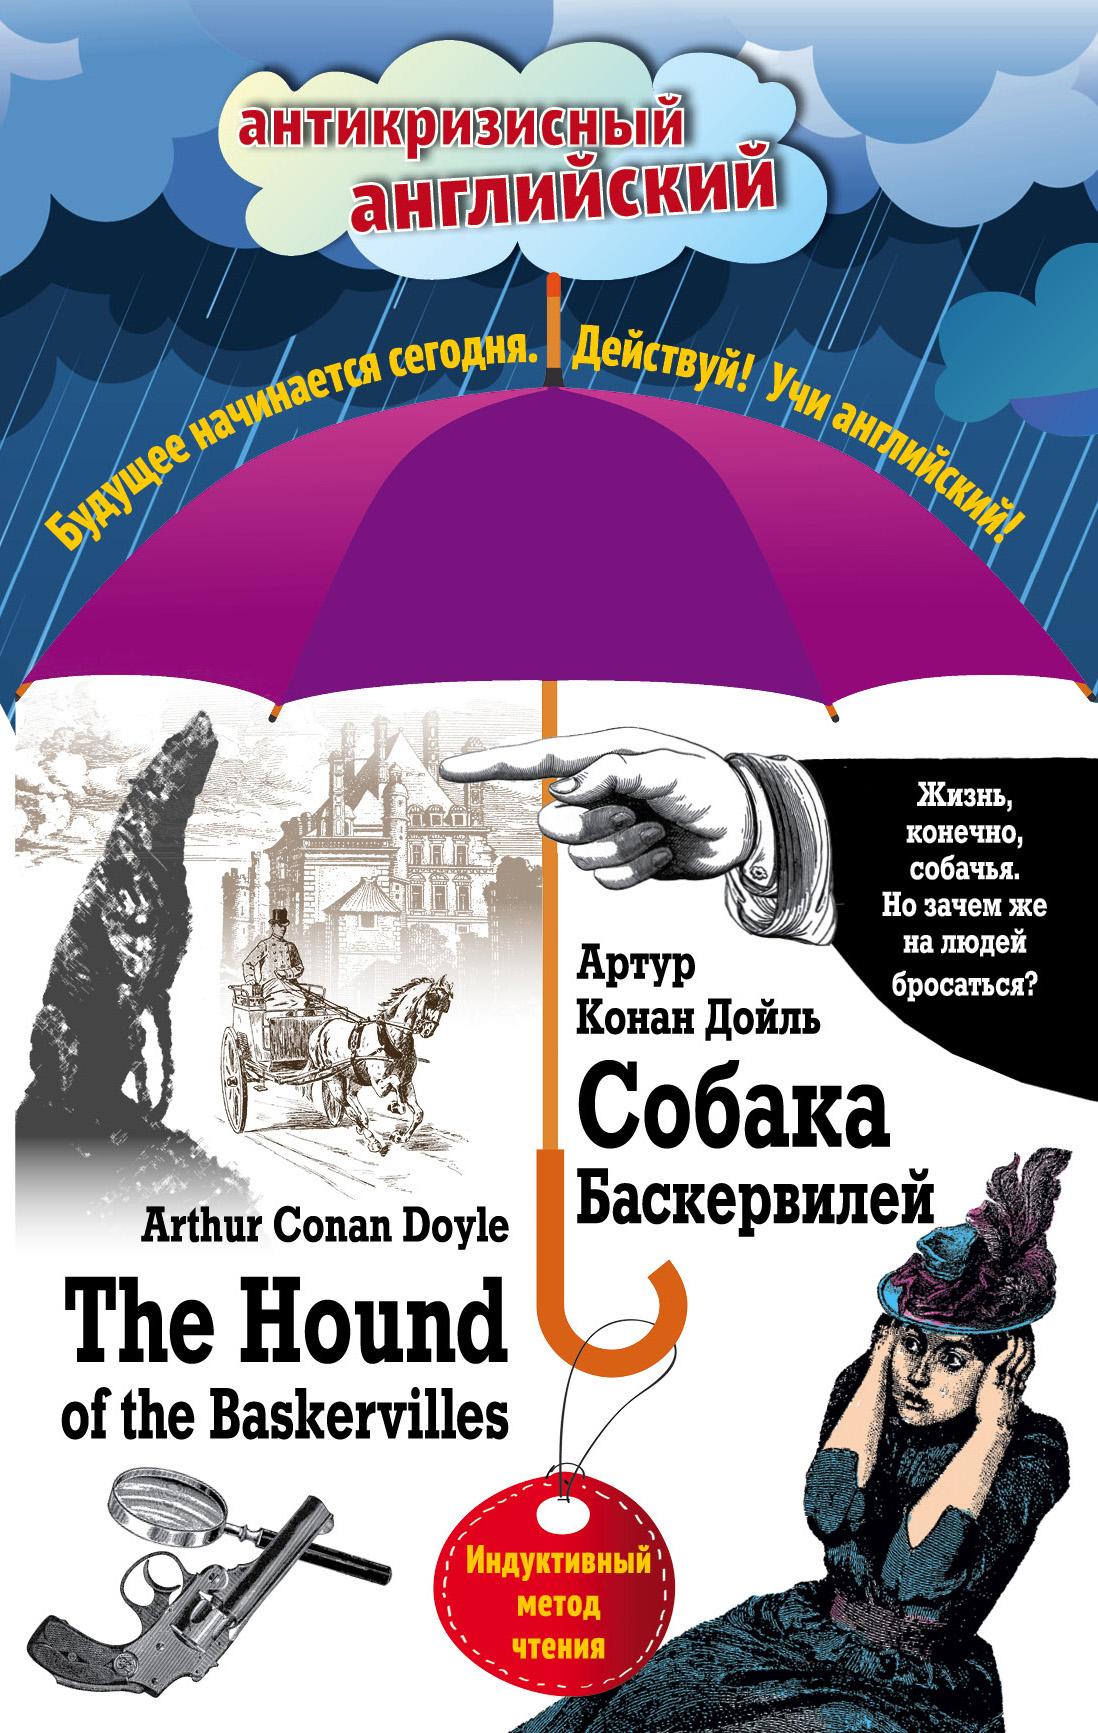 Артур Конан Дойл Собака Баскервилей  The Hound of the Baskervilles Индуктивный метод чтения